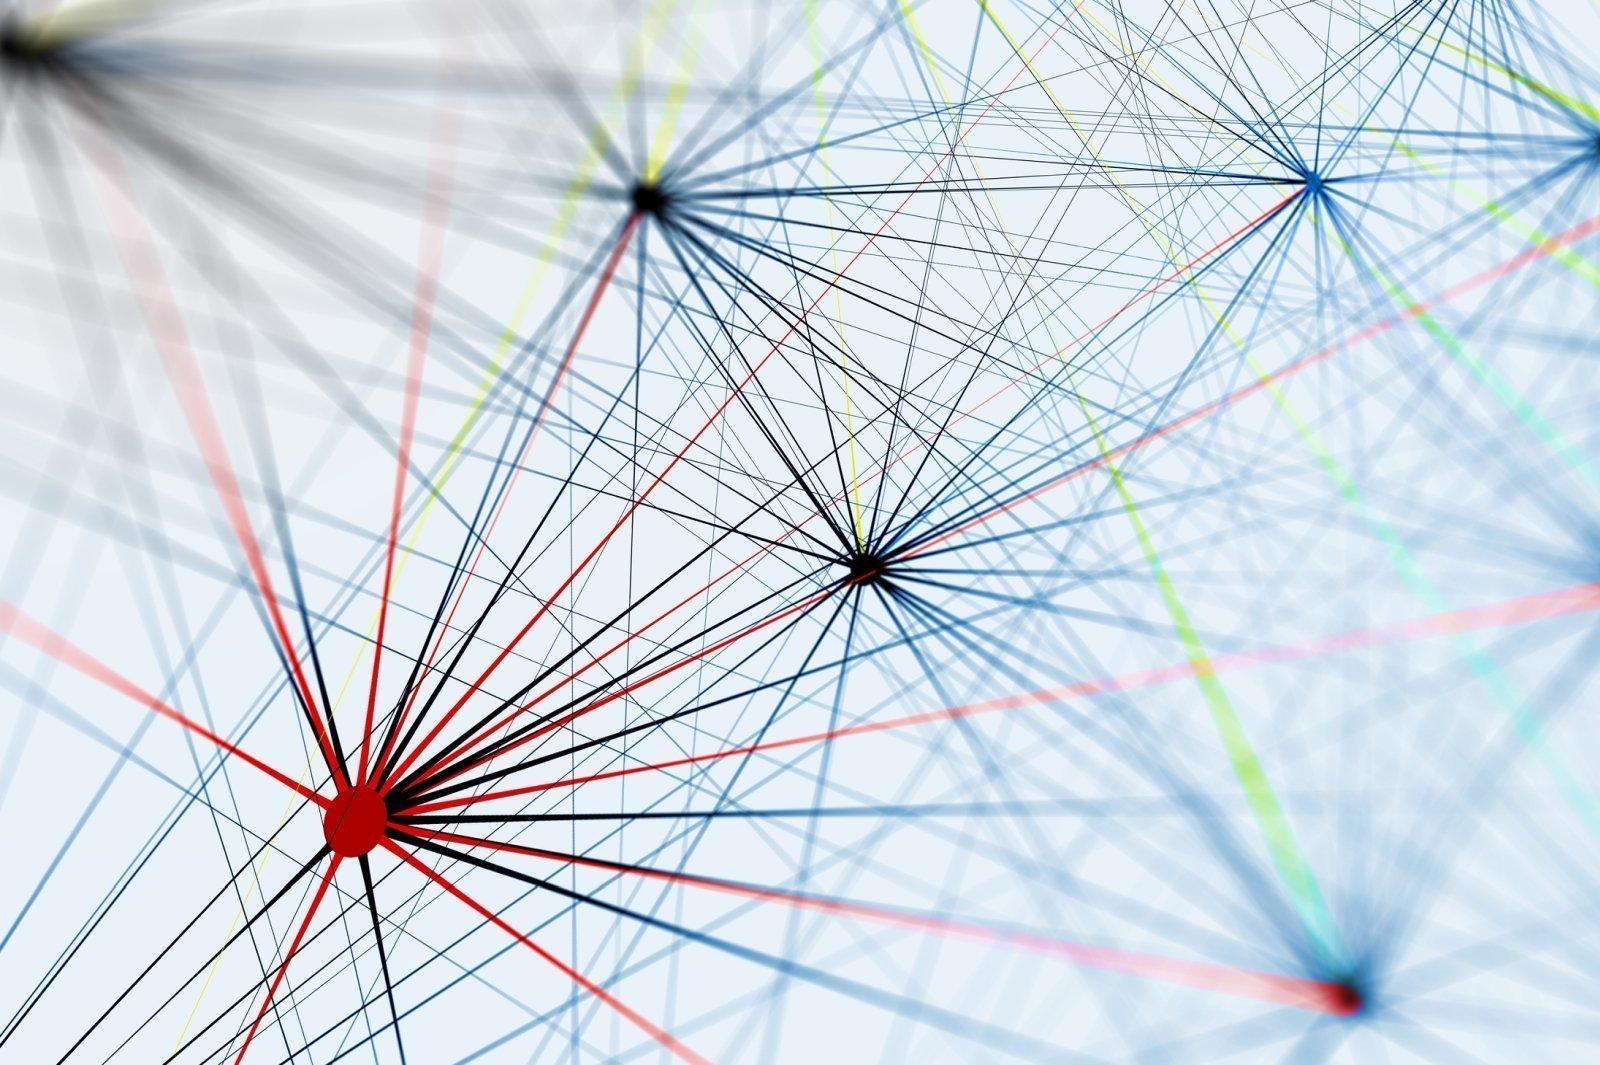 Network medicine